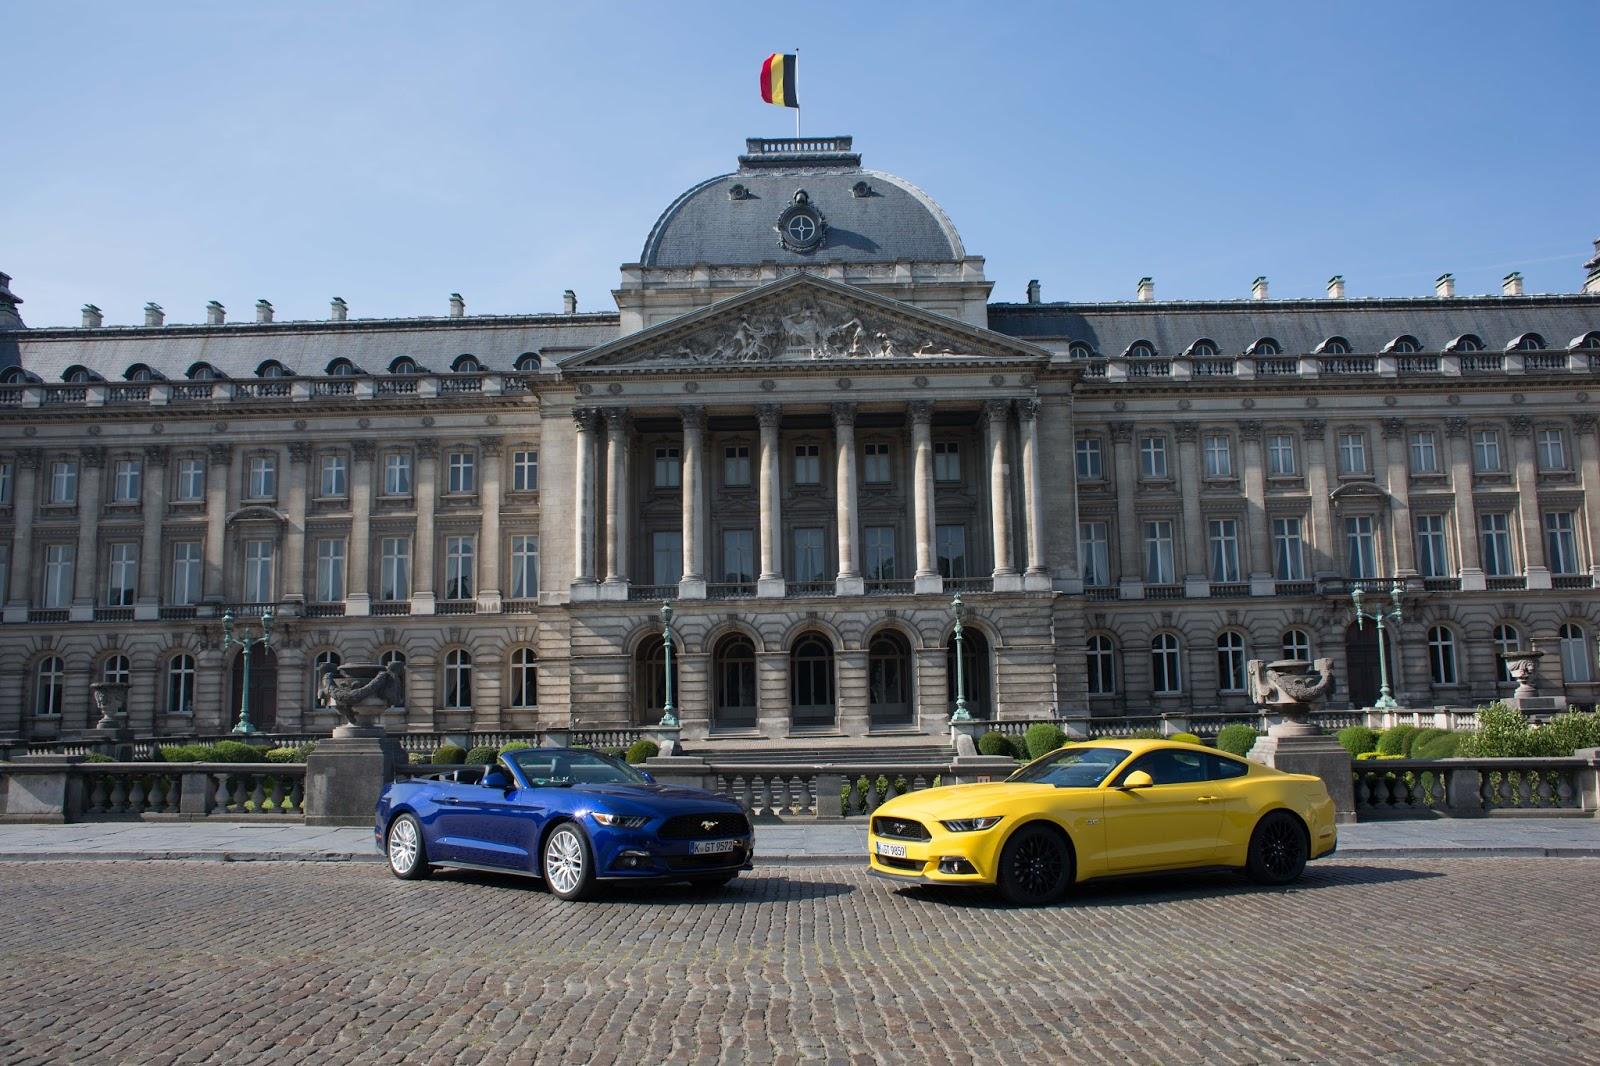 Best SellingSportsCar MustangBelgium Ο... τυφώνας Ford Mustang εξαπλώνεται σε όλο τον κόσμο και ξεπουλάει! Bestseller, cabrio, Ford Mustang, Muscle cars, Sales, πωλήσεις, πωλήσεις αυτοκινήτων